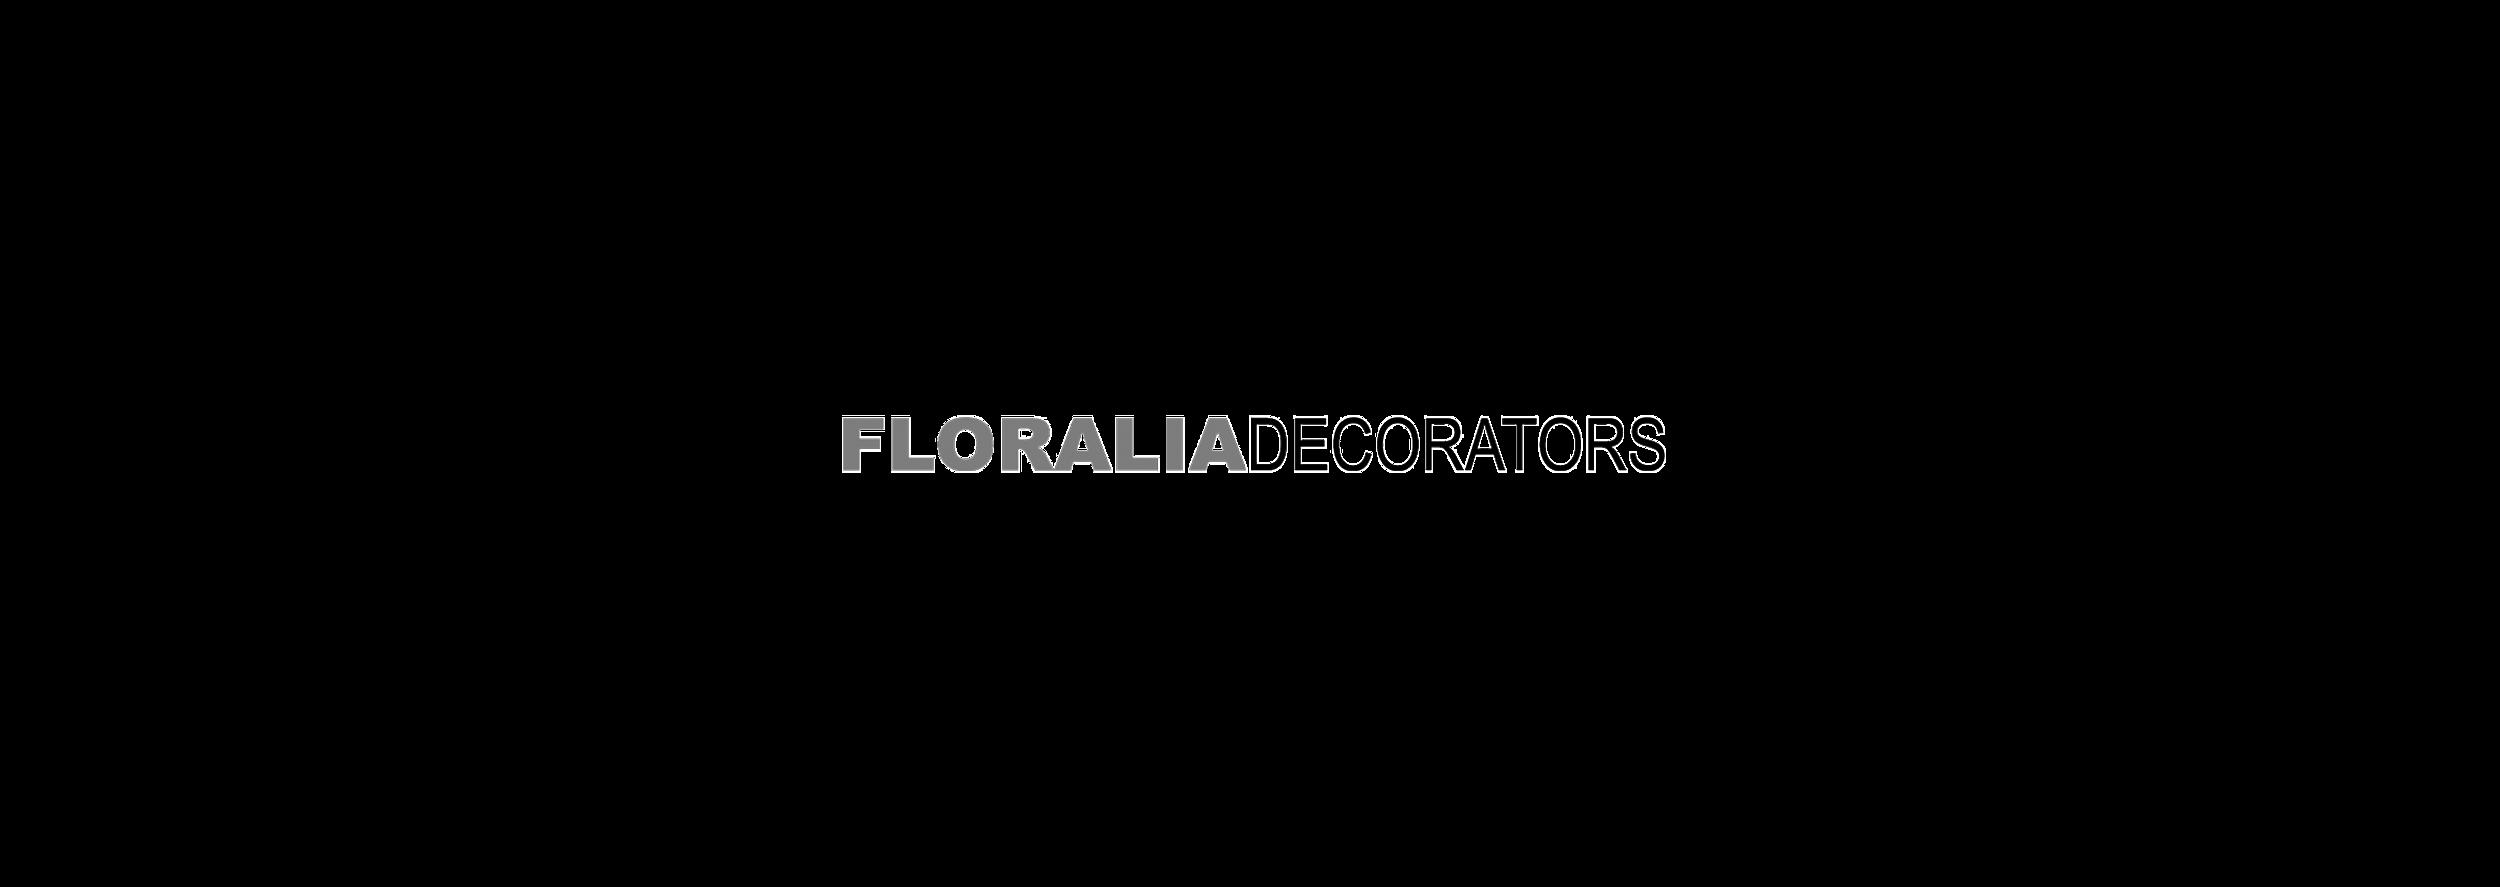 floraliadecoratorslong.png